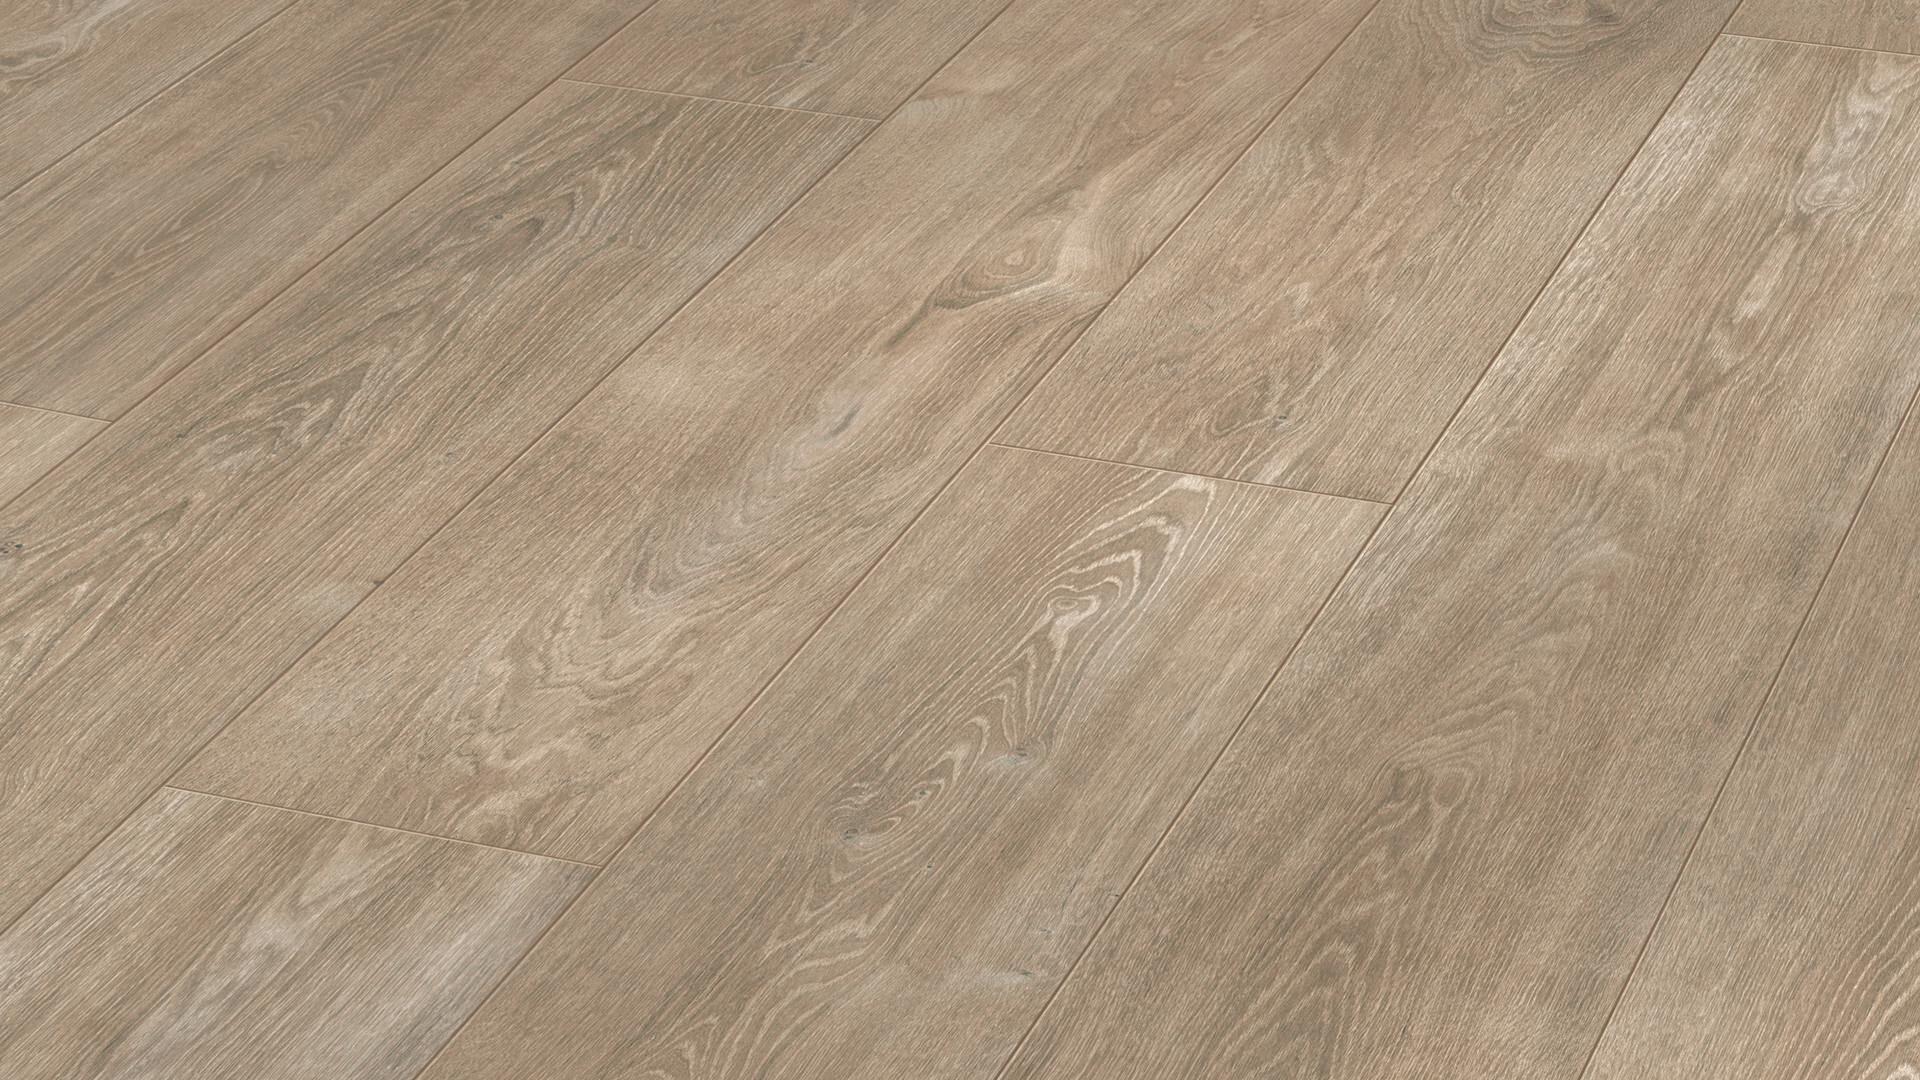 Sol stratifié MeisterDesign. laminate LL 250 S Chêne gris blanc 6277